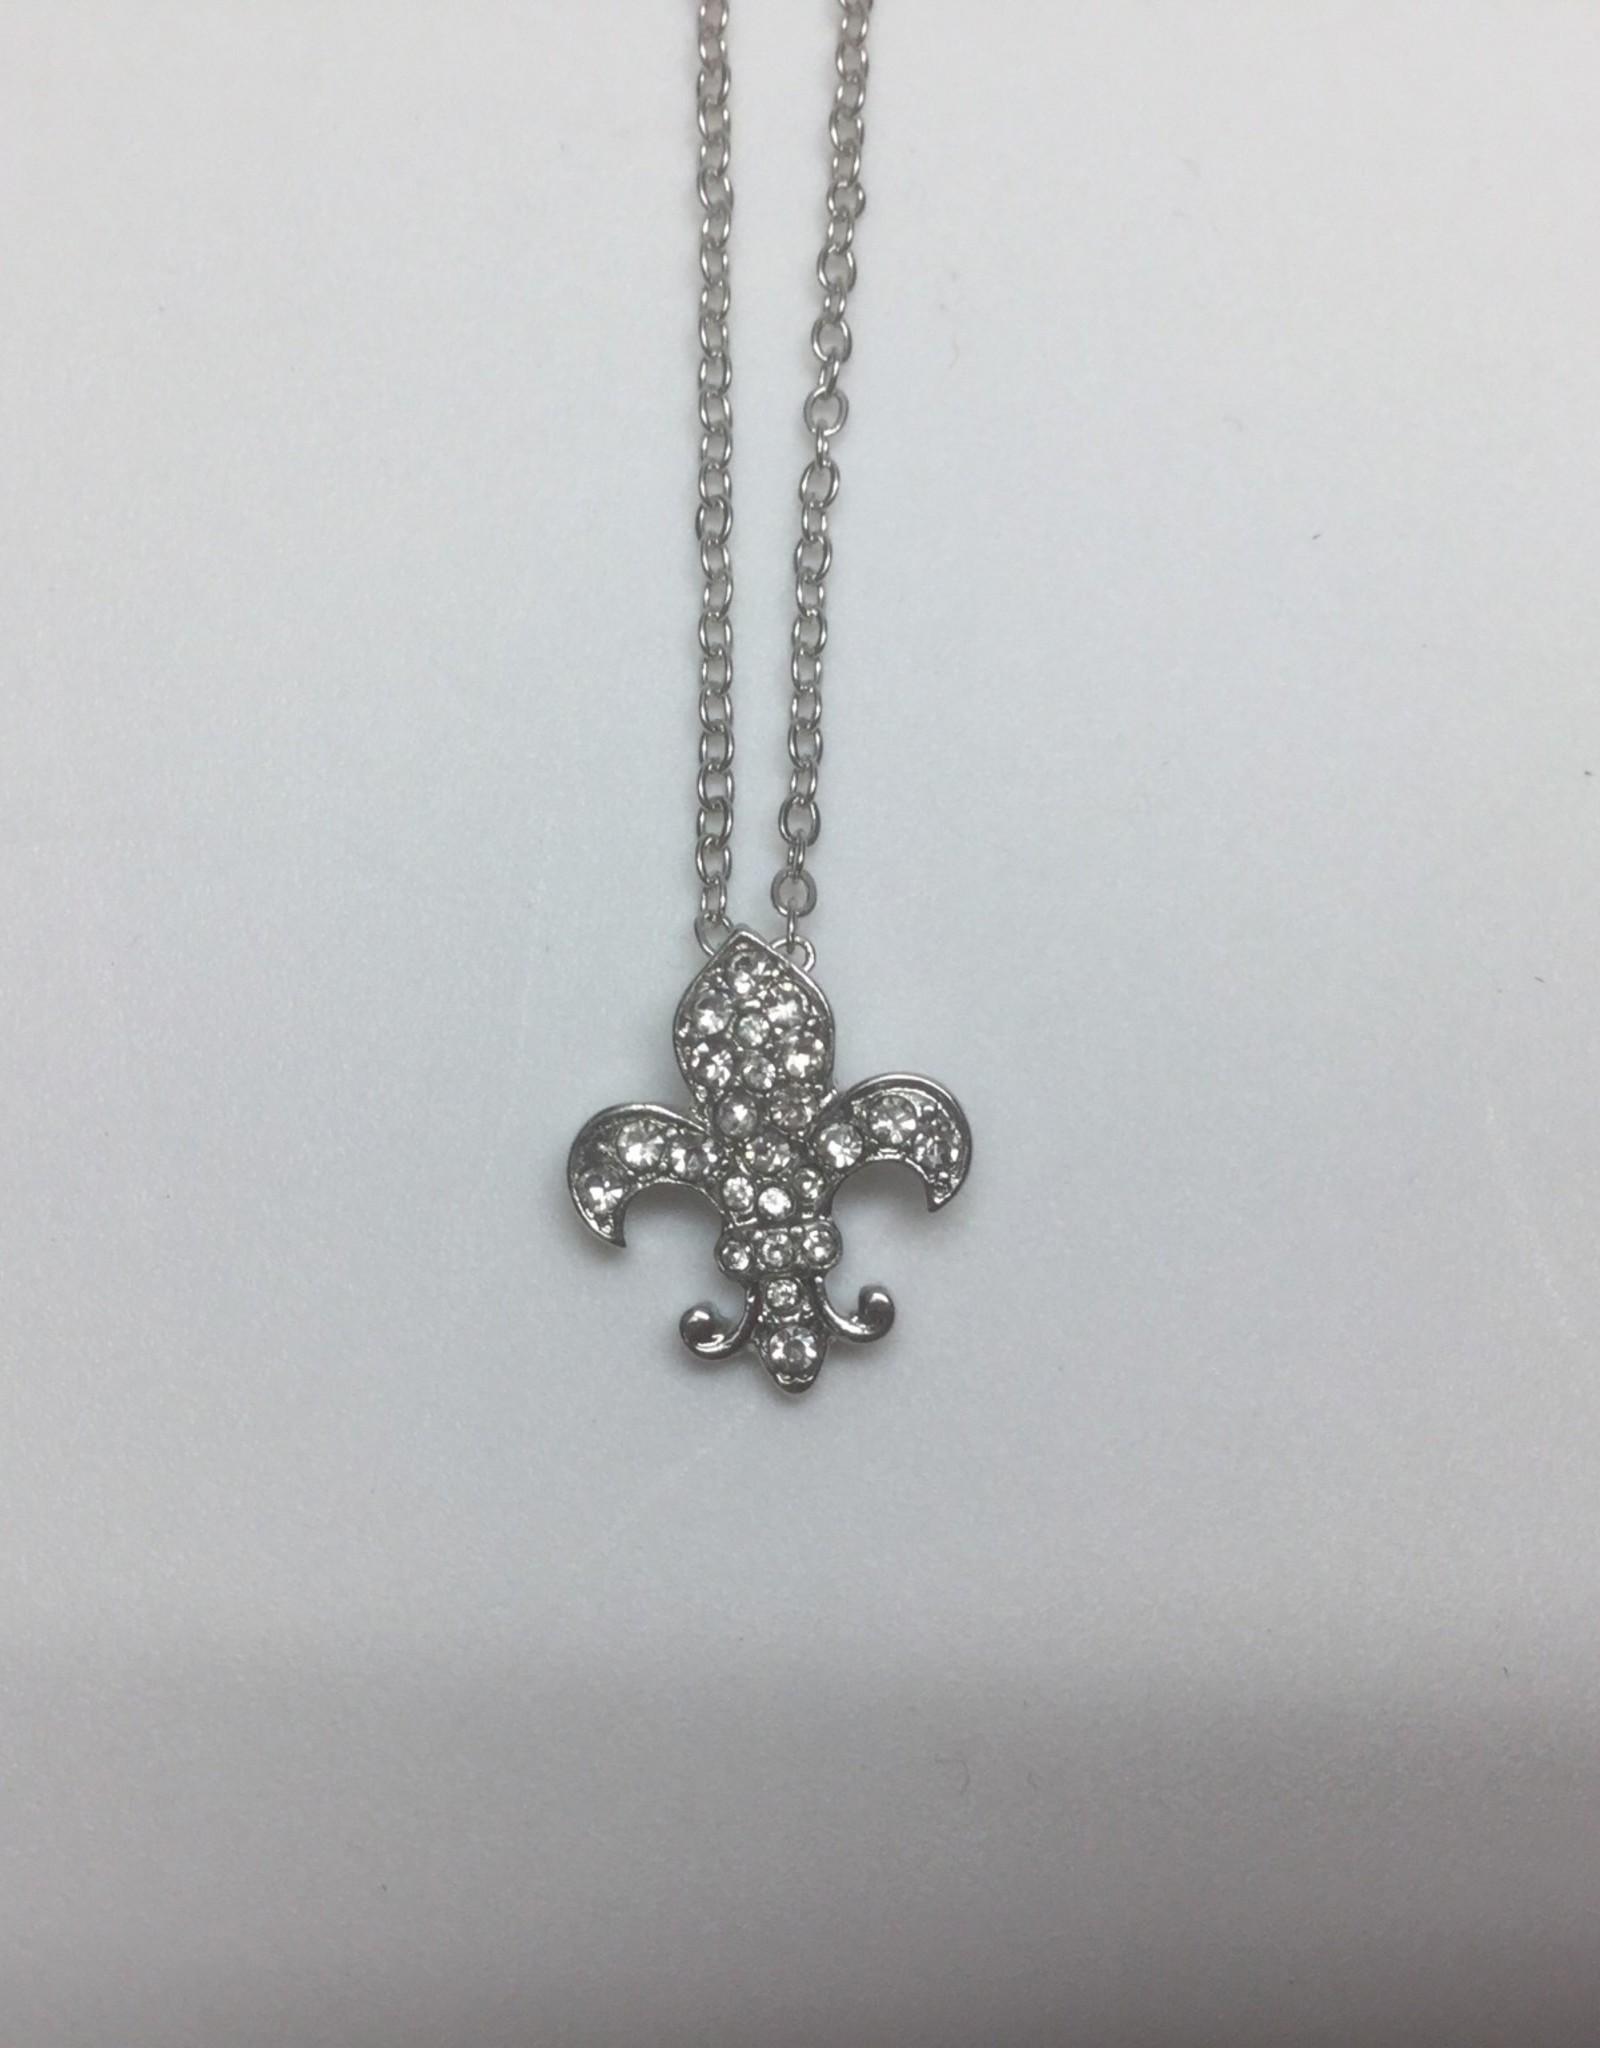 FDL Medium Rhinestone Necklace